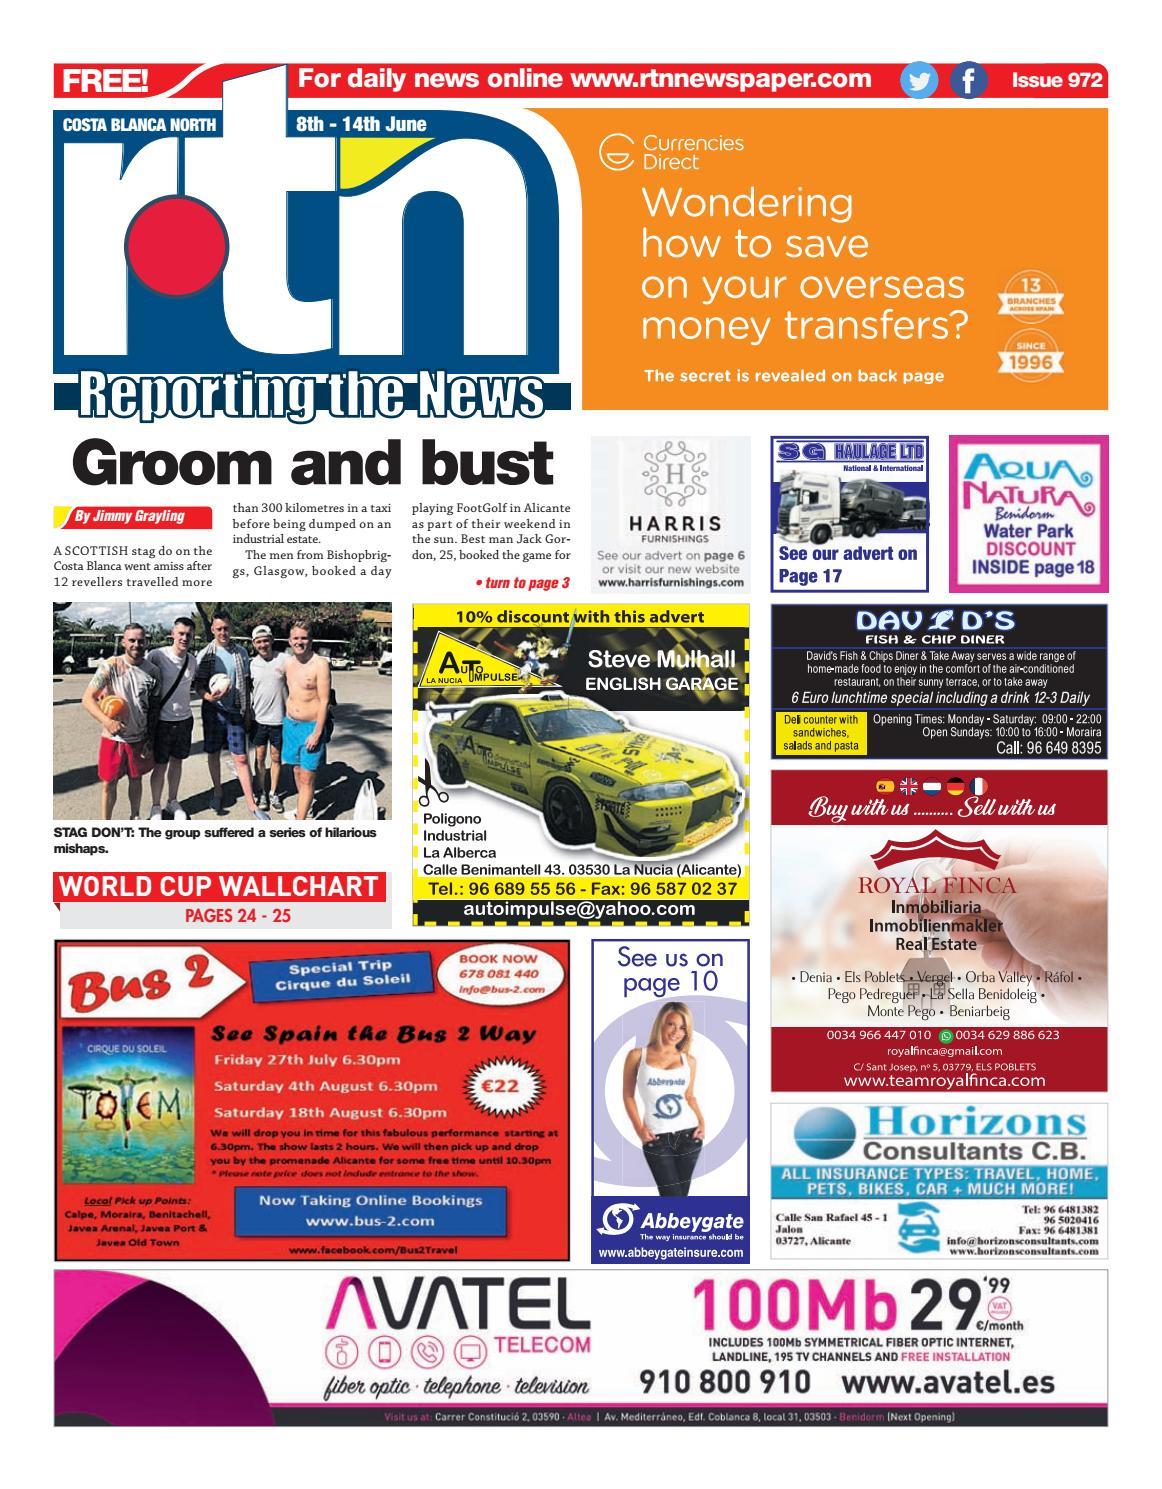 RTN Newspaper - Costa Blanca North 8 - 14 June 2018 Issue